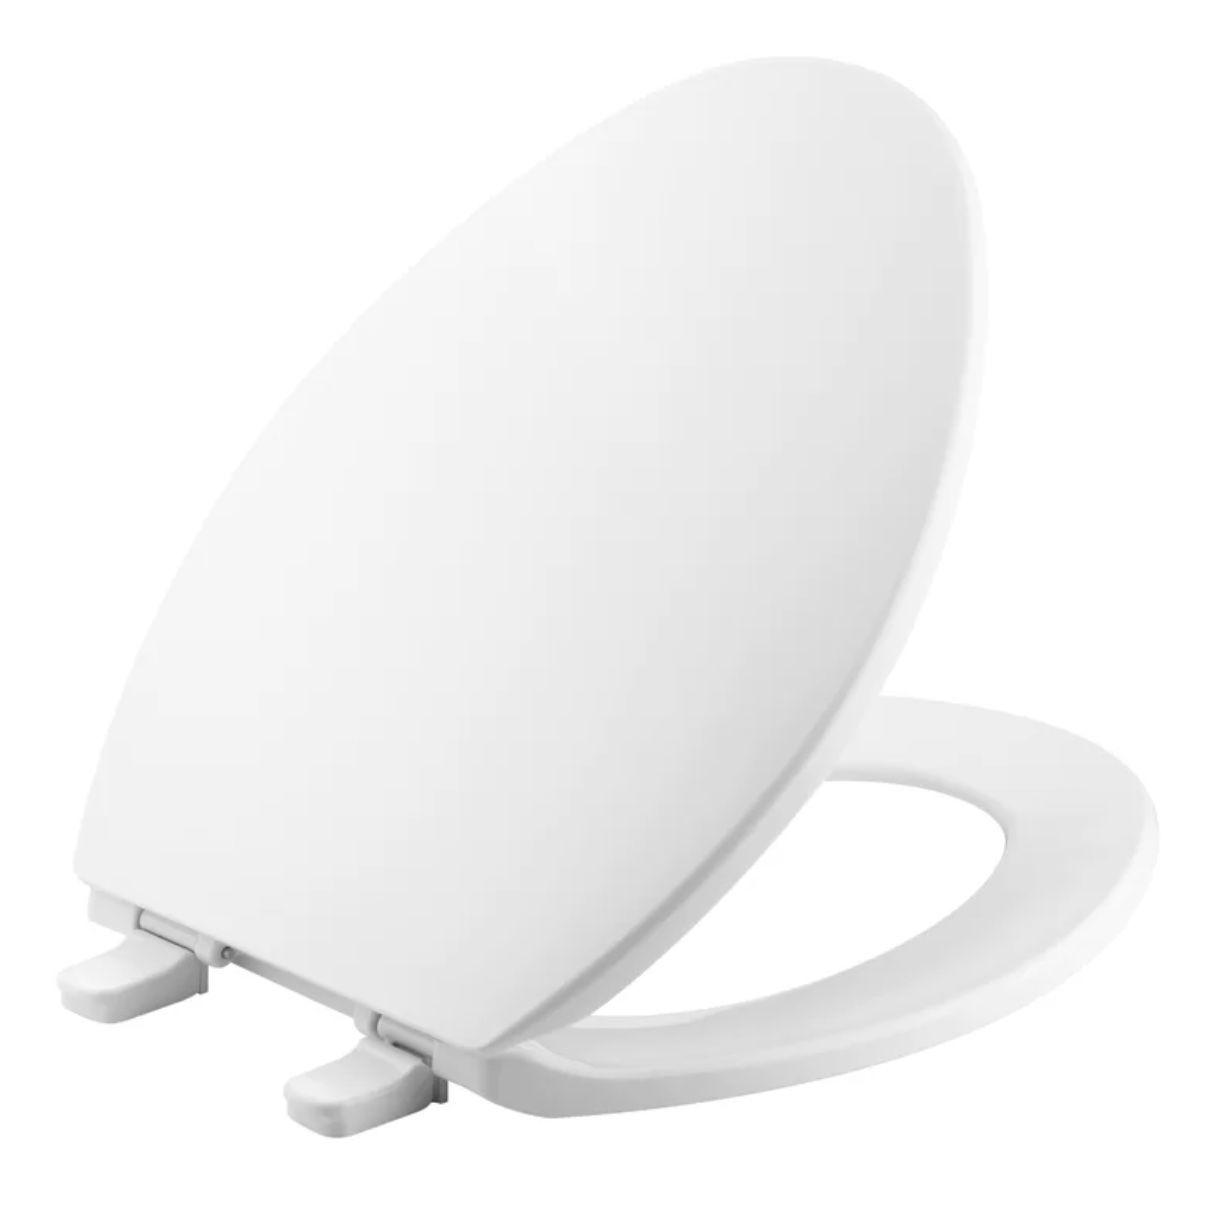 Kohler Brevia Quick-Release Hinges Elongated Toilet Seat